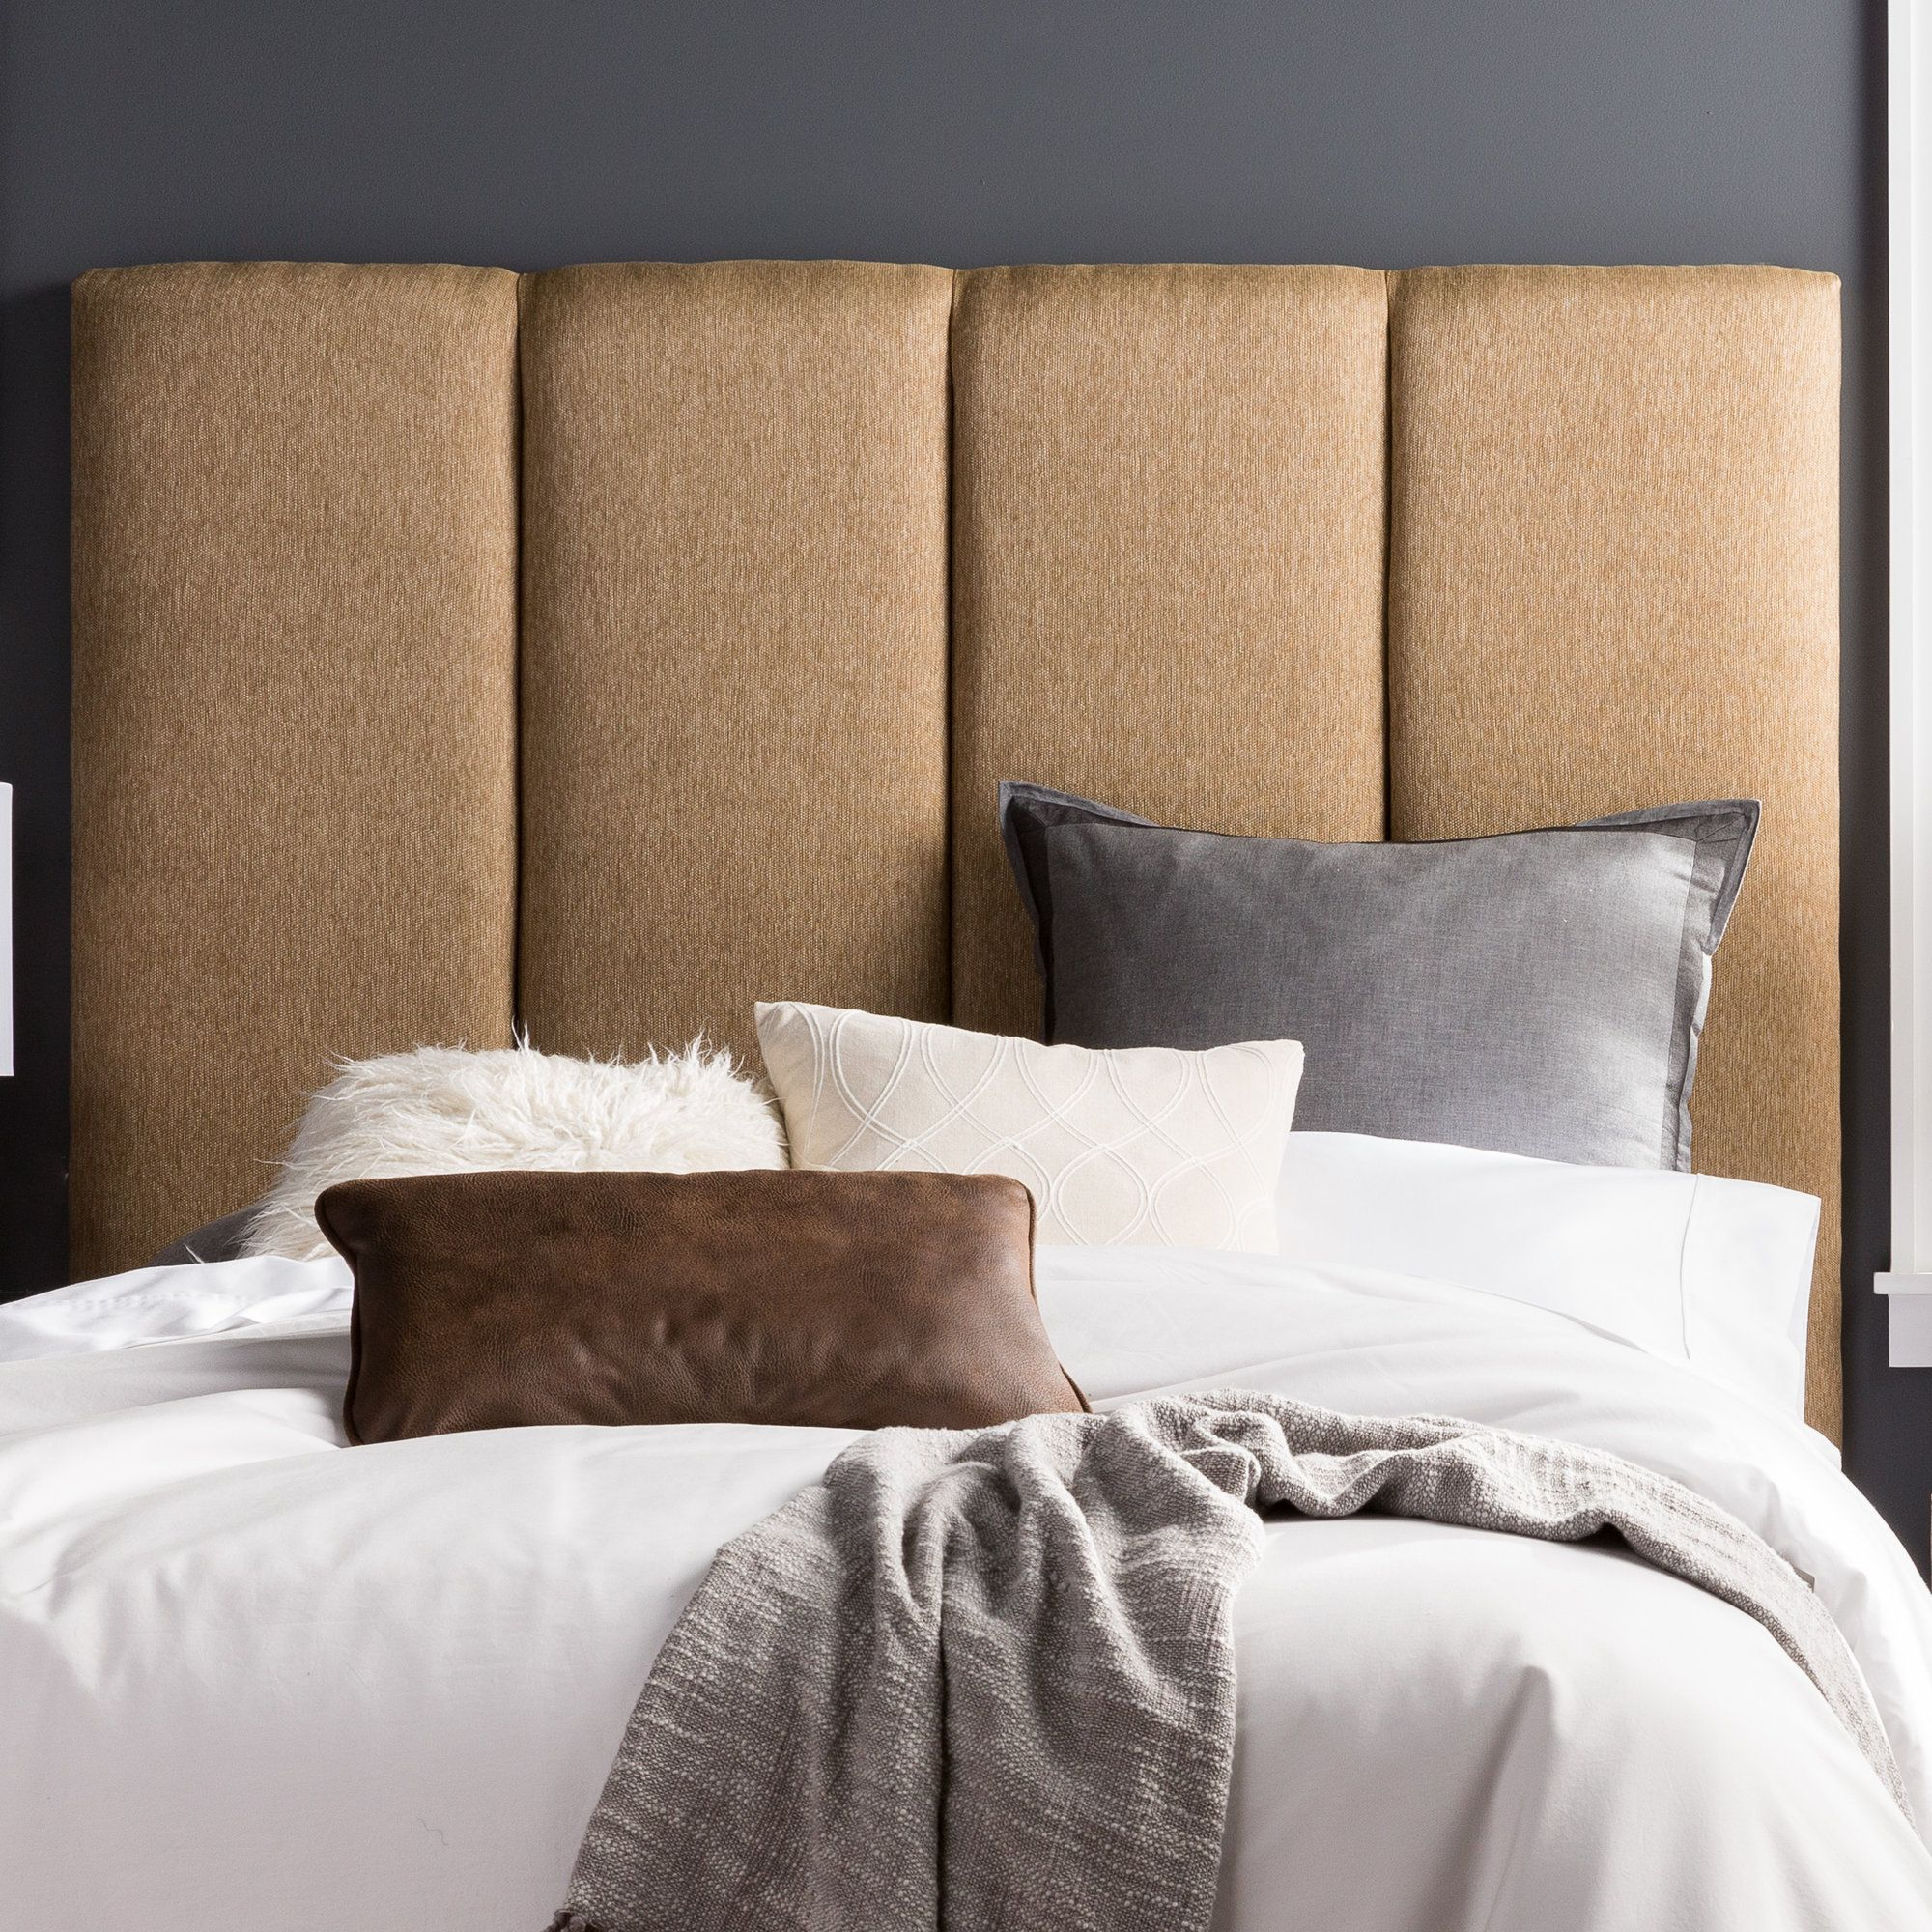 Lytle Upholstered Panel Headboard Headboard Upholstered Walls Bed Headboard Design